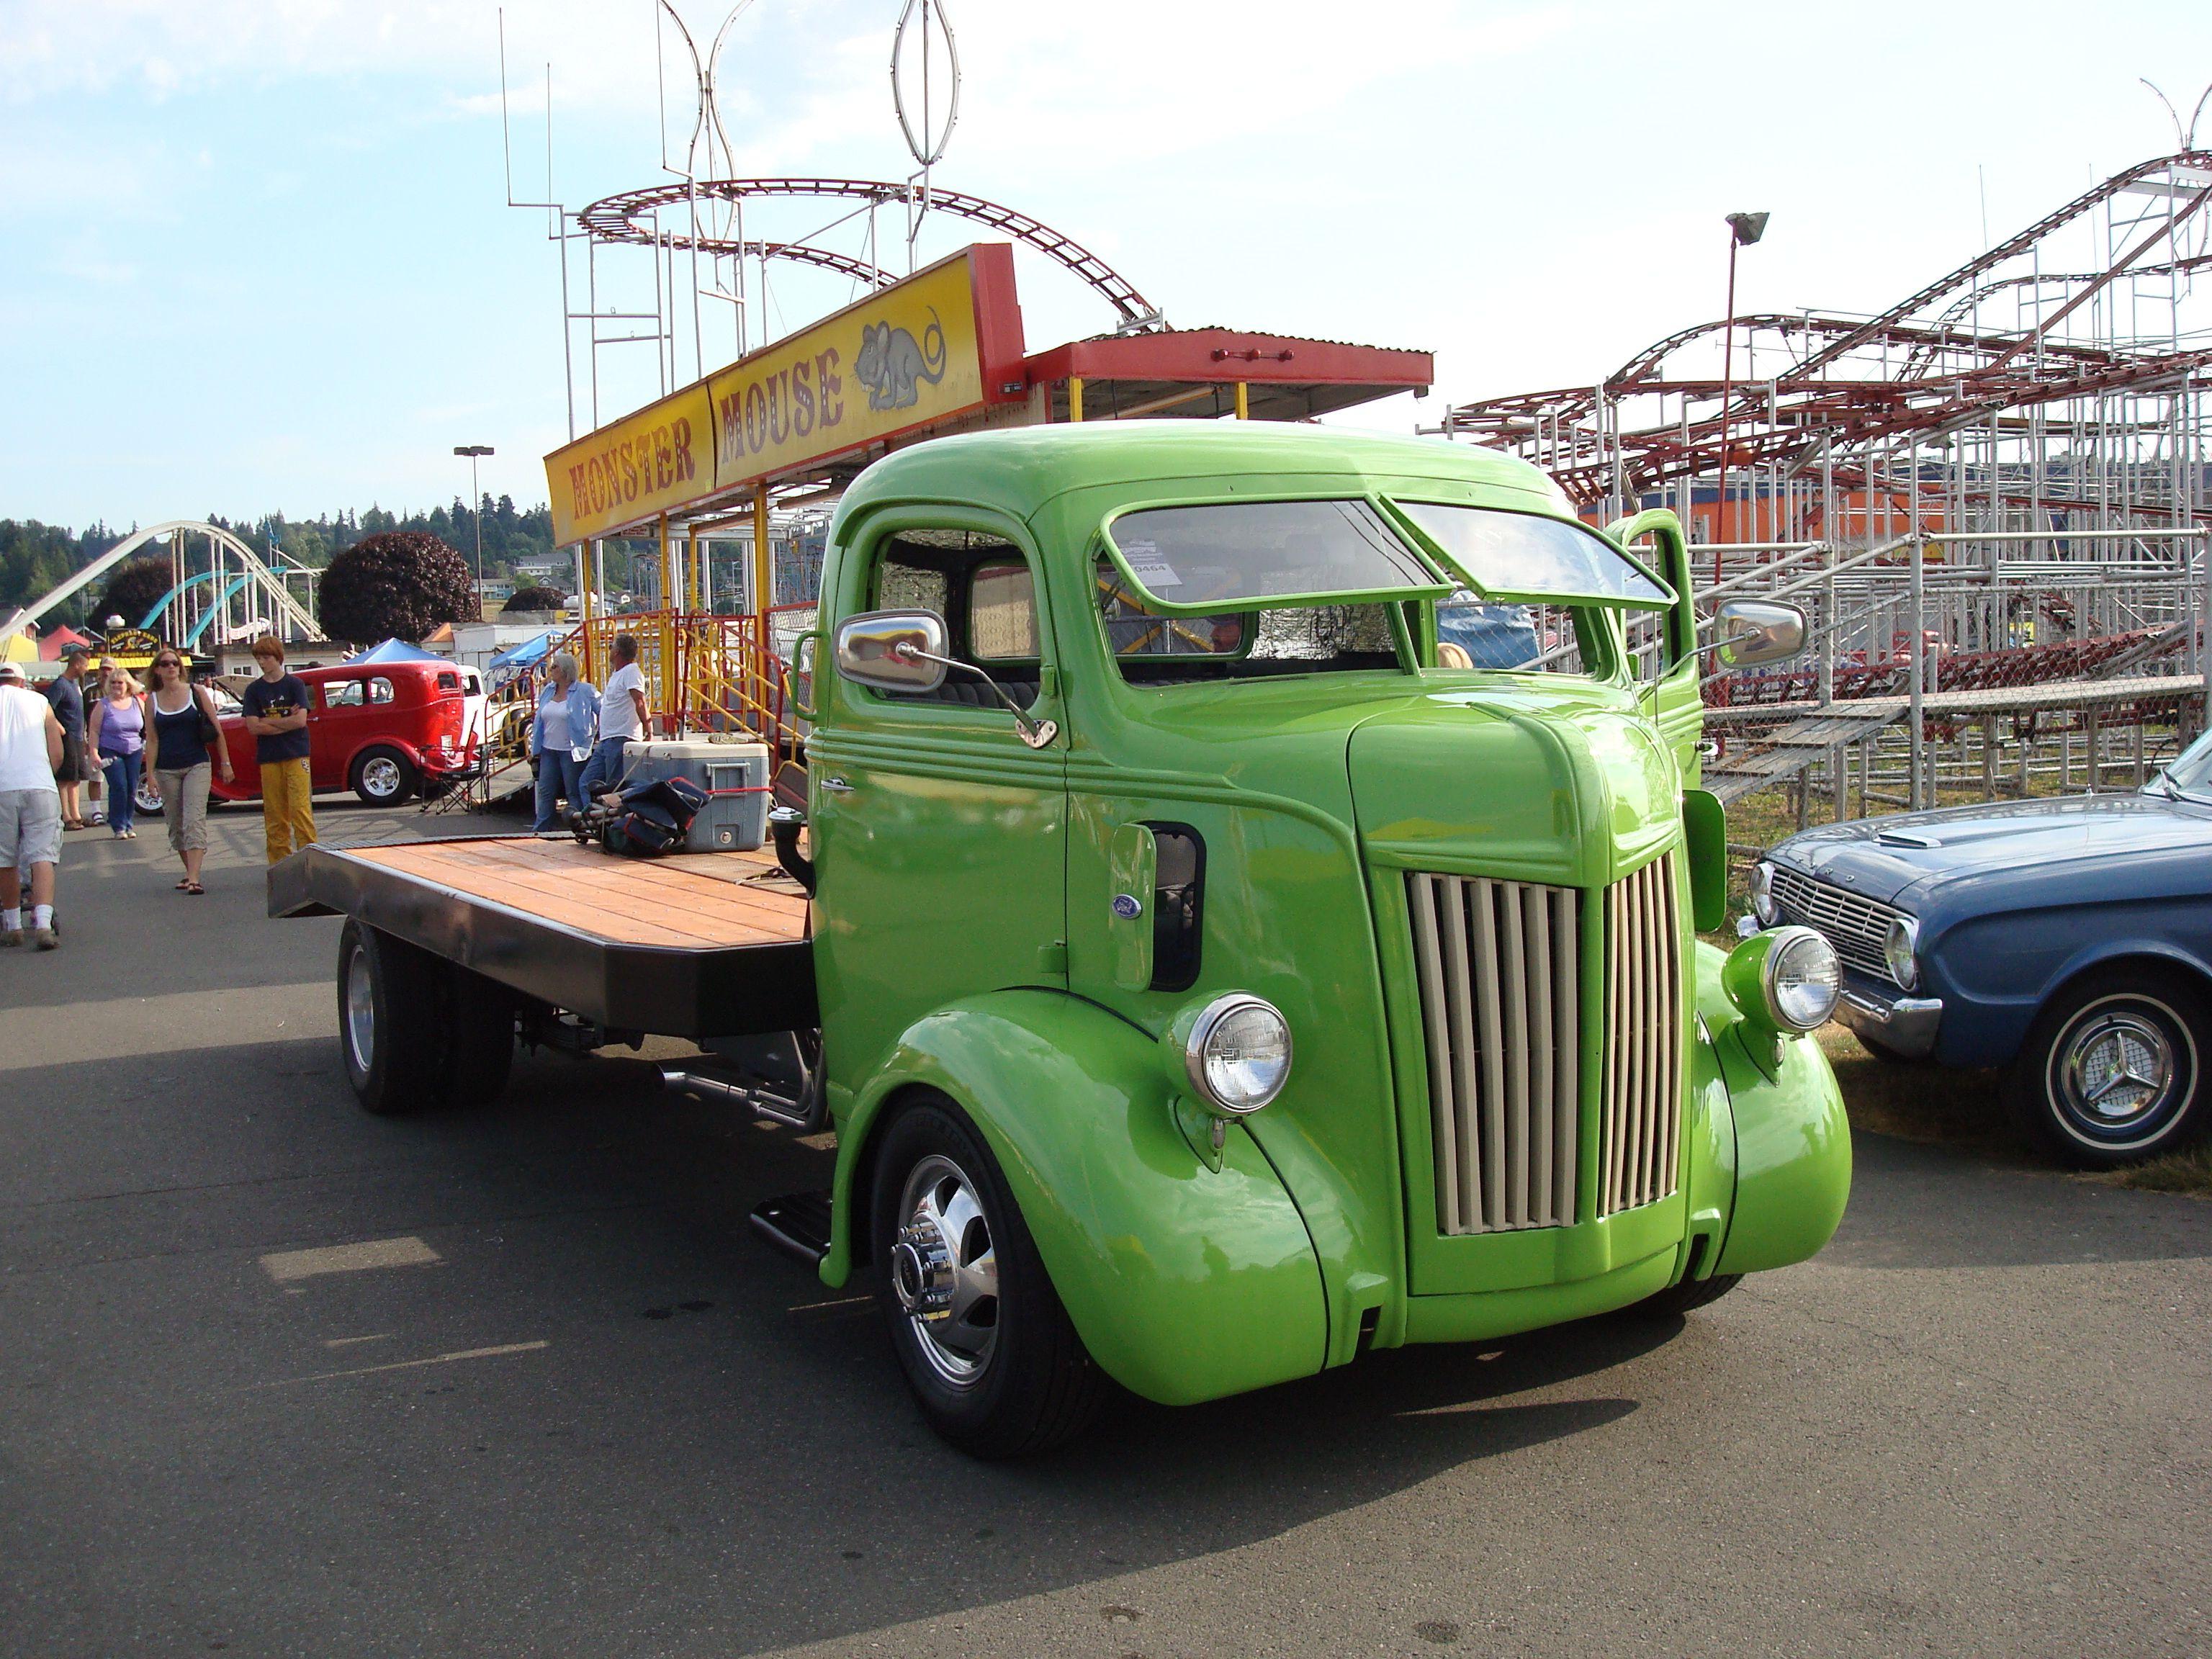 1947 ford coe for sale manitoba saskatchewan chapter craigslist also for sale 1953 ford